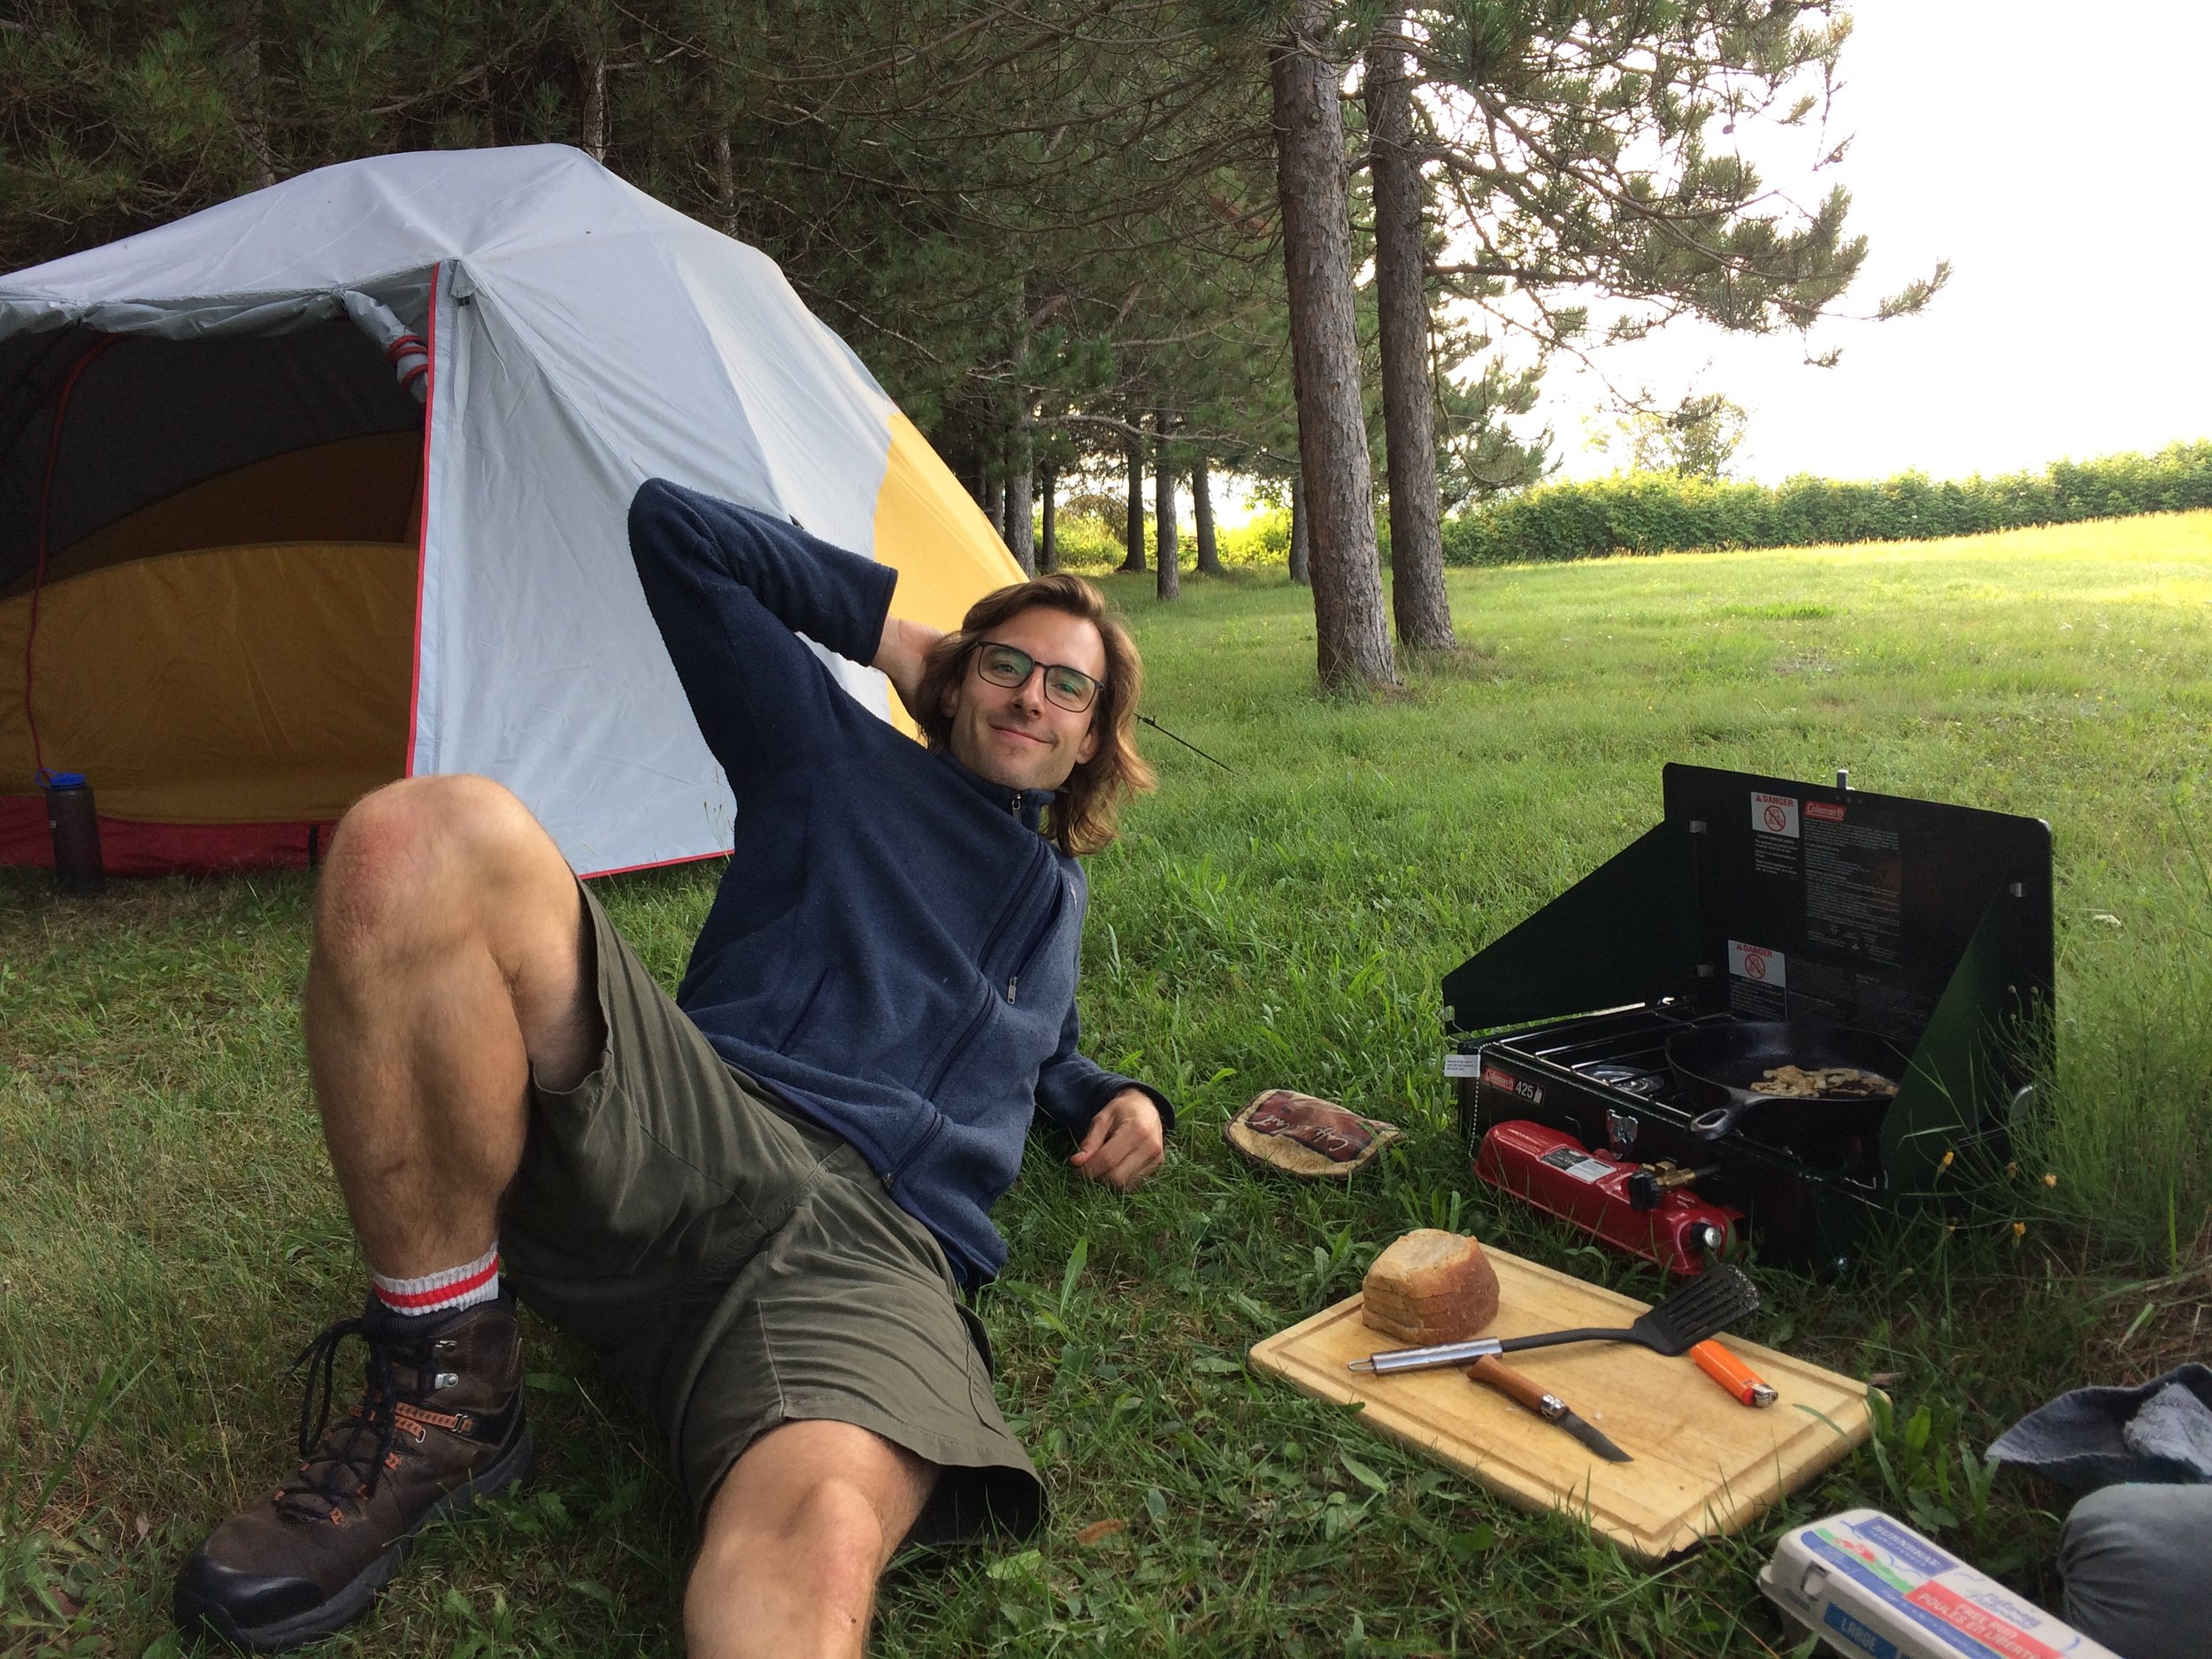 Mat is always a model camper.